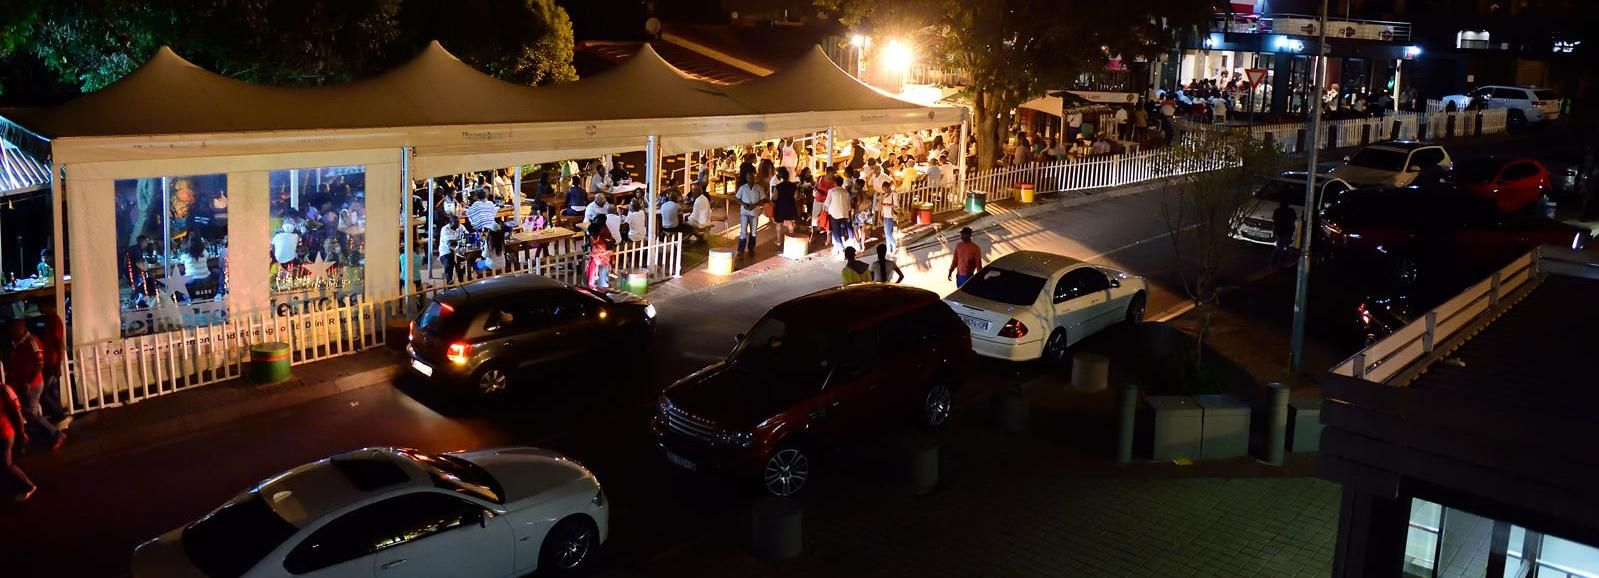 Johannesburg: visite nocturne de Soweto